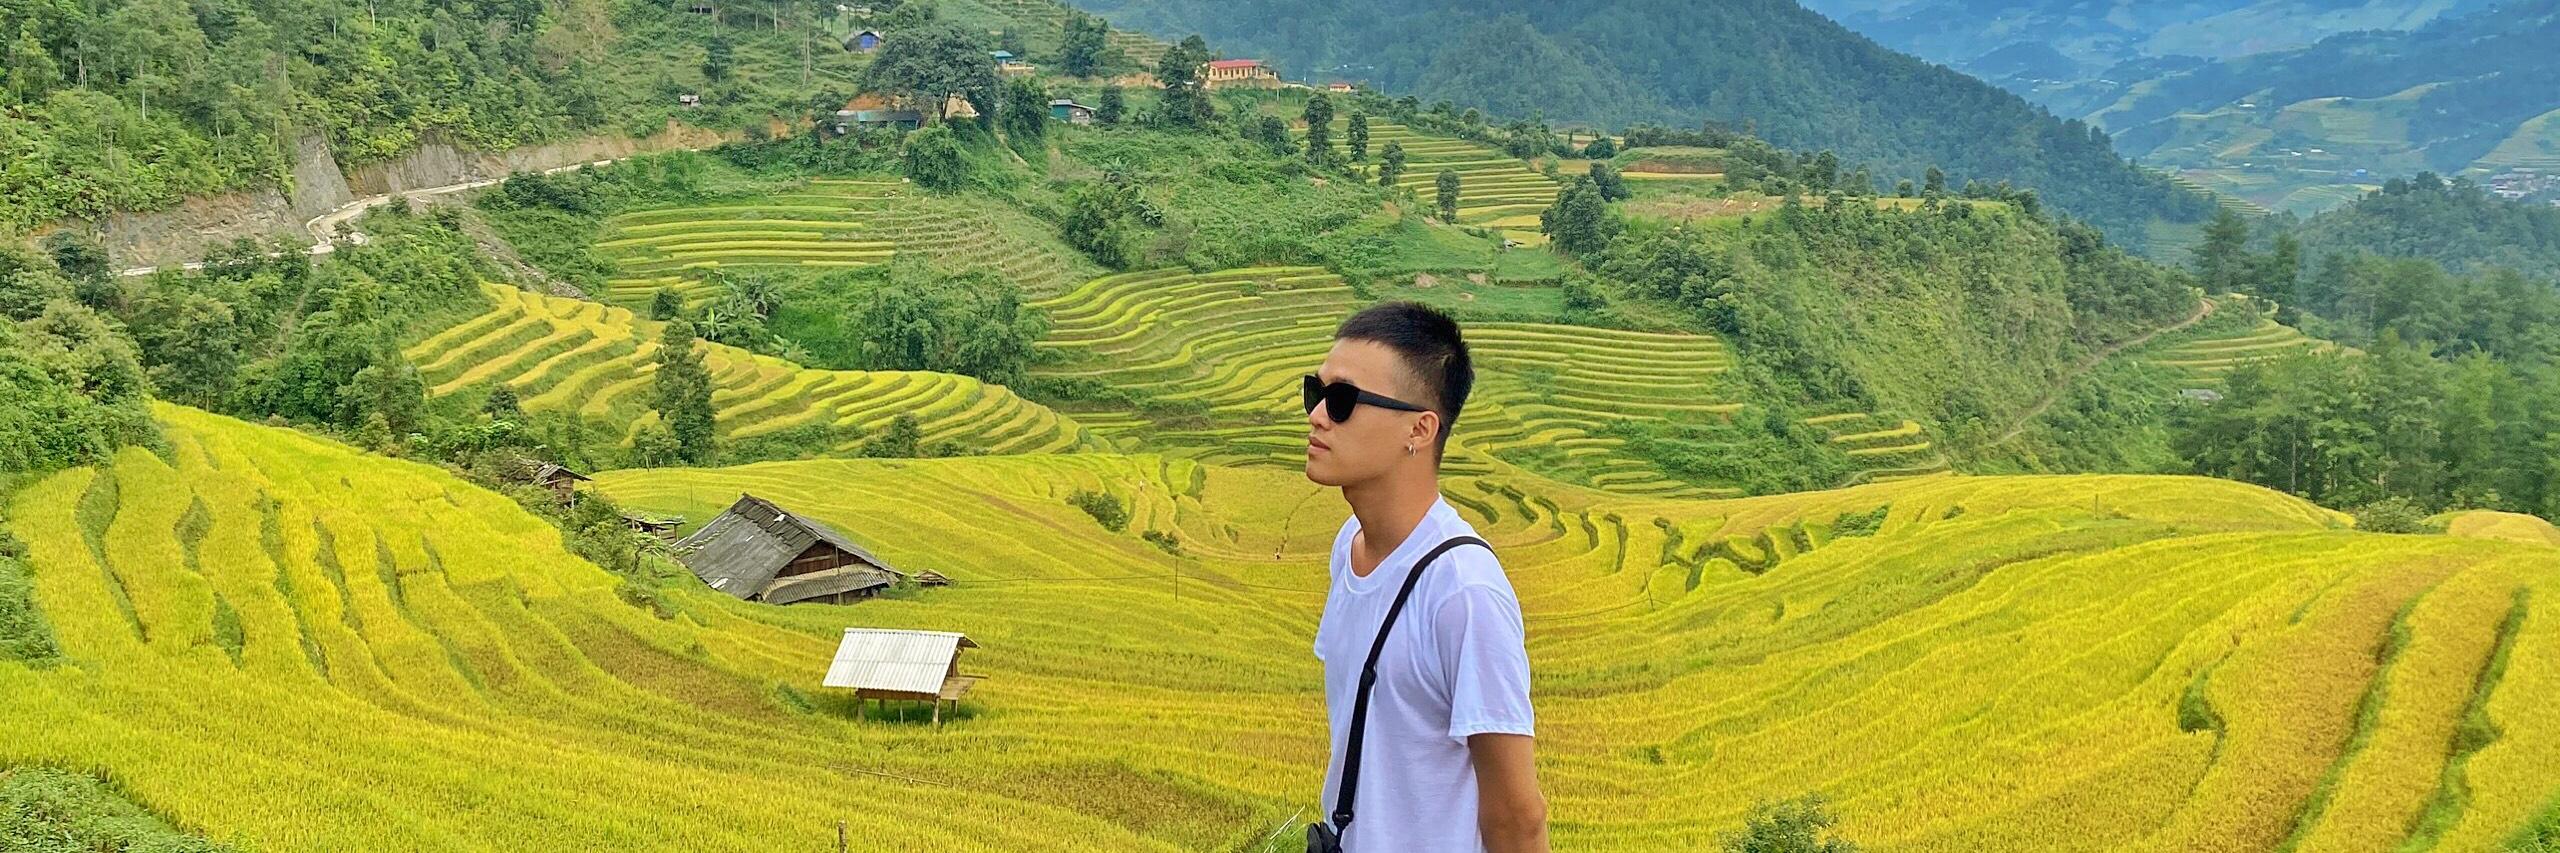 https://gody.vn/blog/12532935681505101494/post/kham-pha-mua-vang-mu-cang-chai-me-man-nhung-em-be-vung-cao-dang-yeu-7397